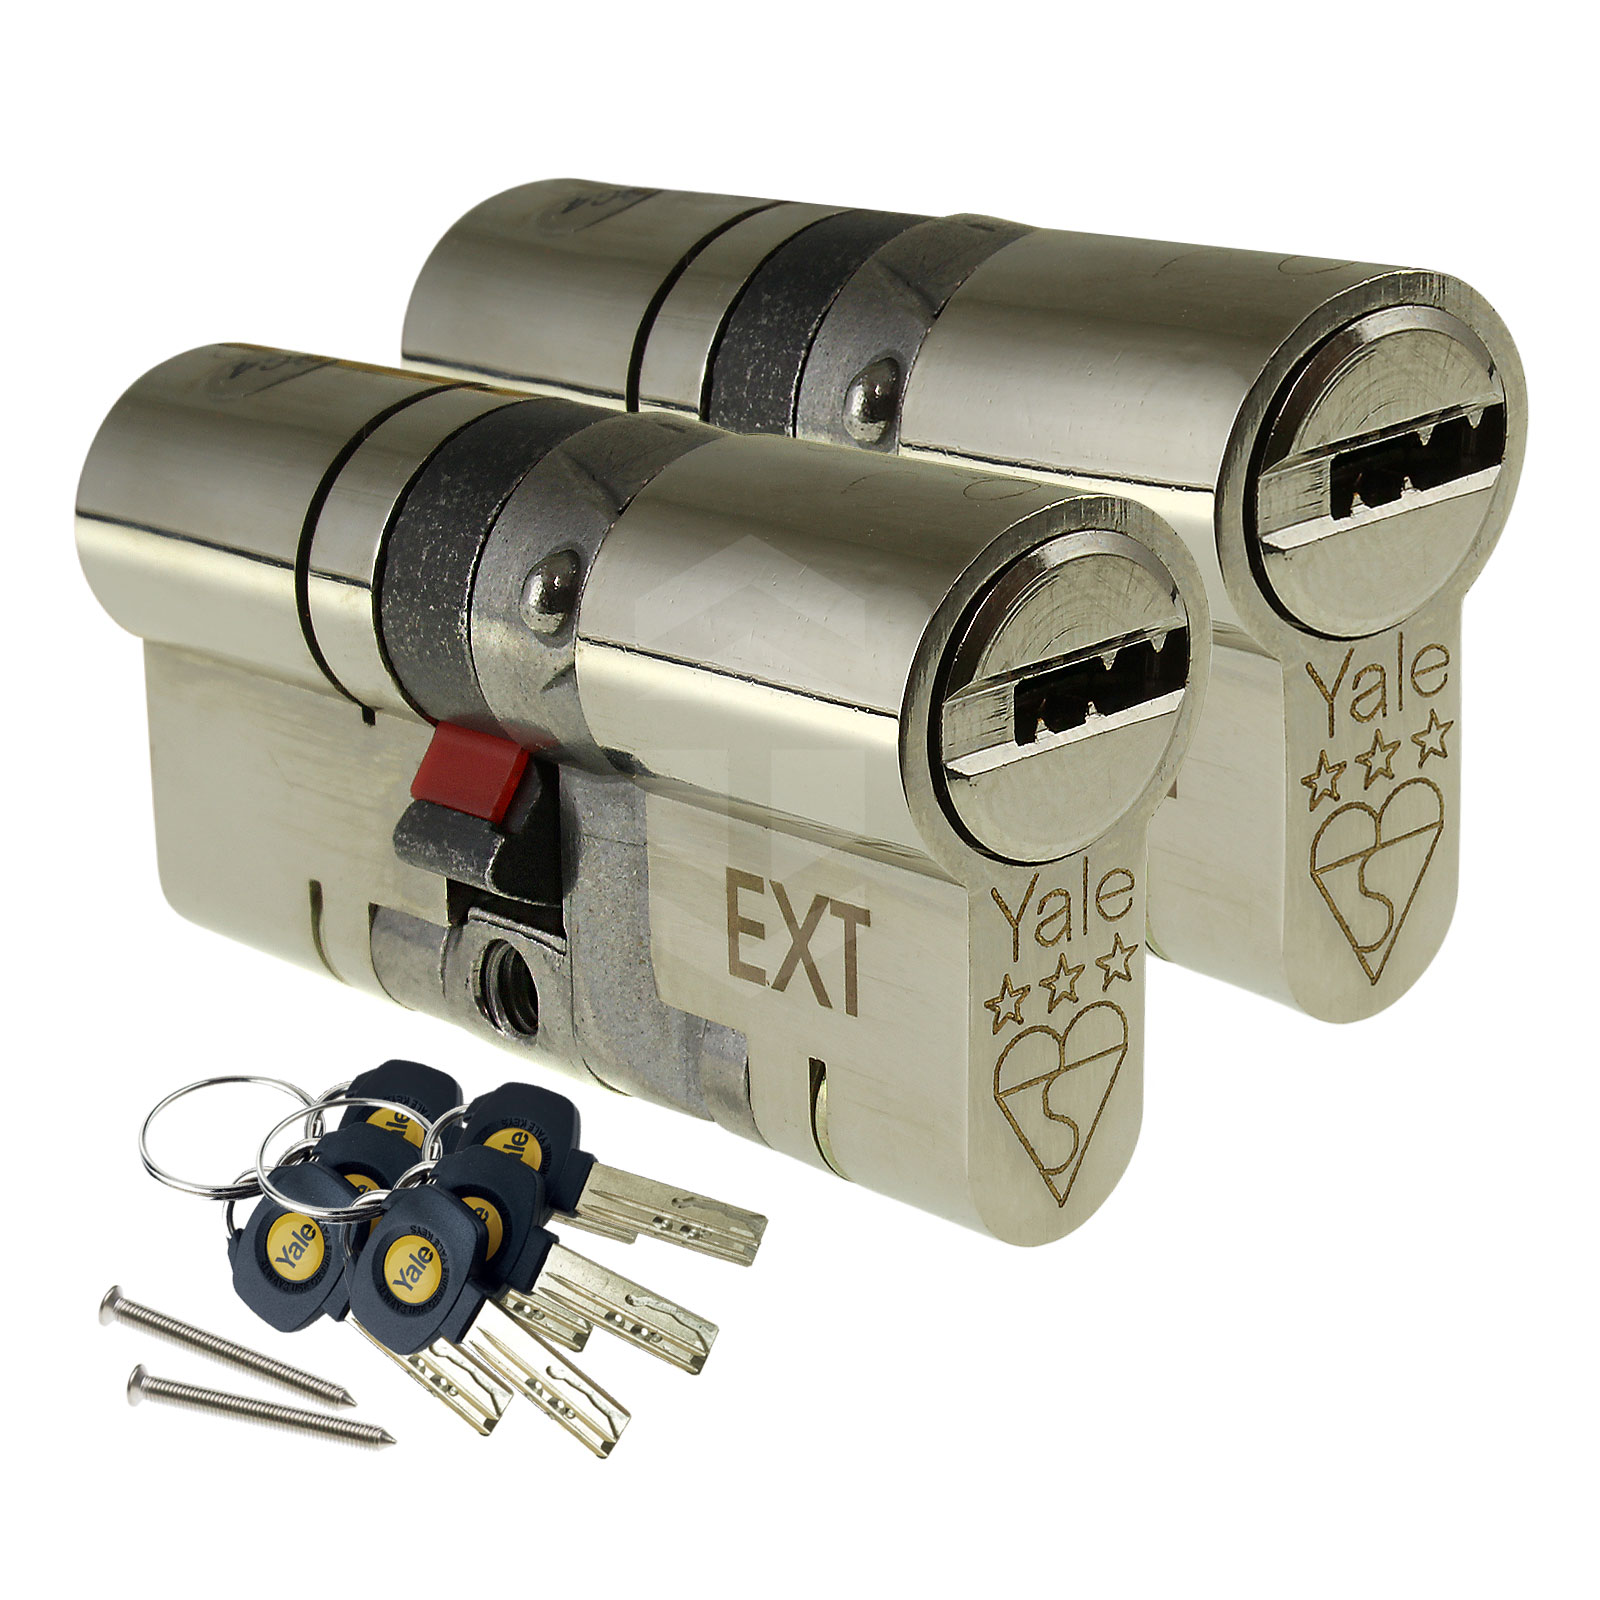 YALE Platinum 3 Star Euro Cyliner Barrels X 2 6 Keys 55//40